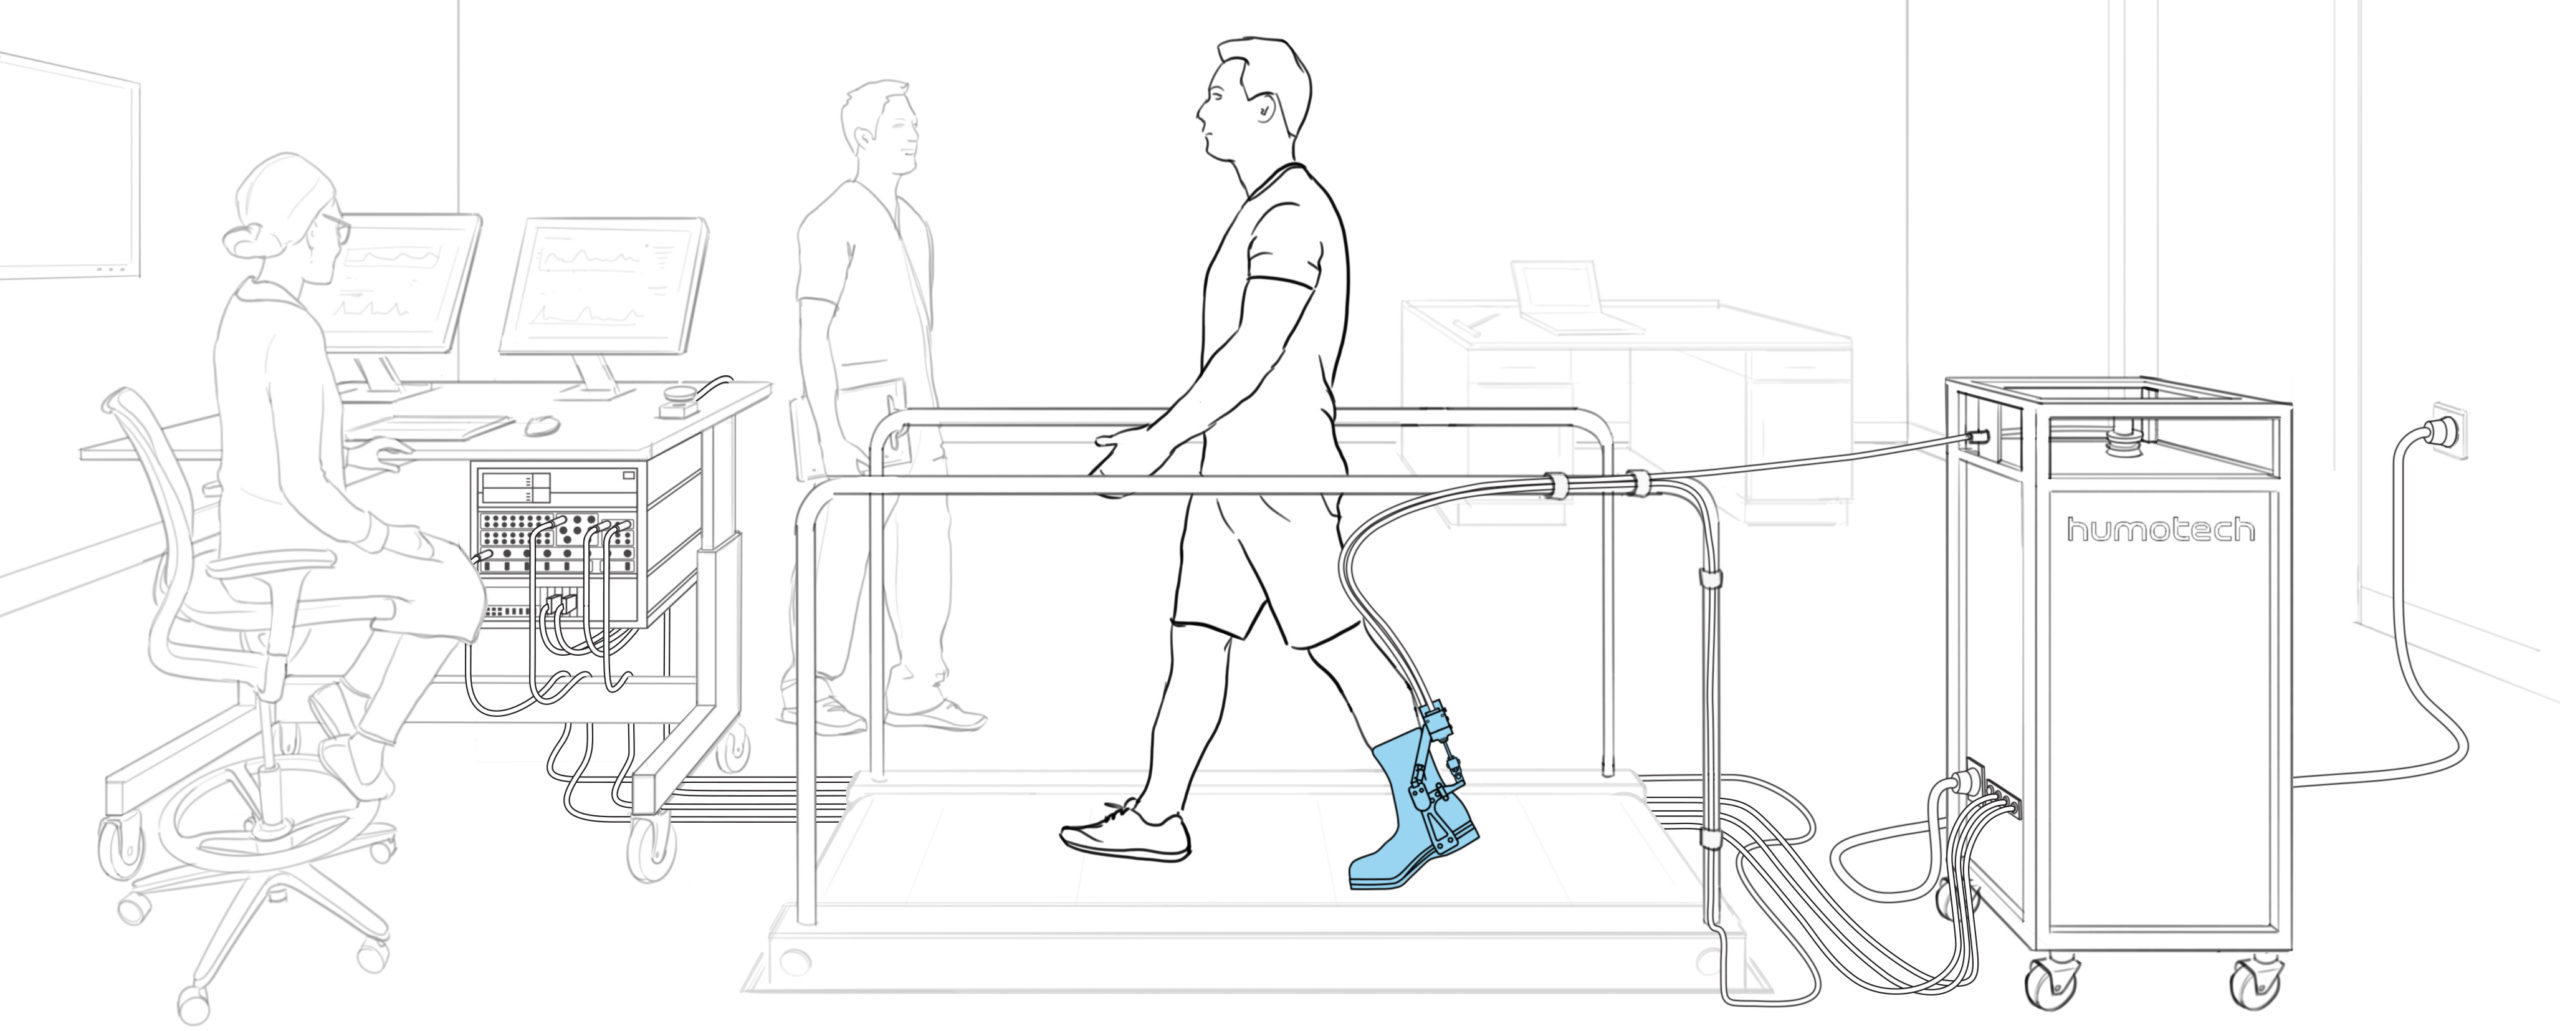 Full-Size Caplex System with EXO-005 Ankle Exoskeleton